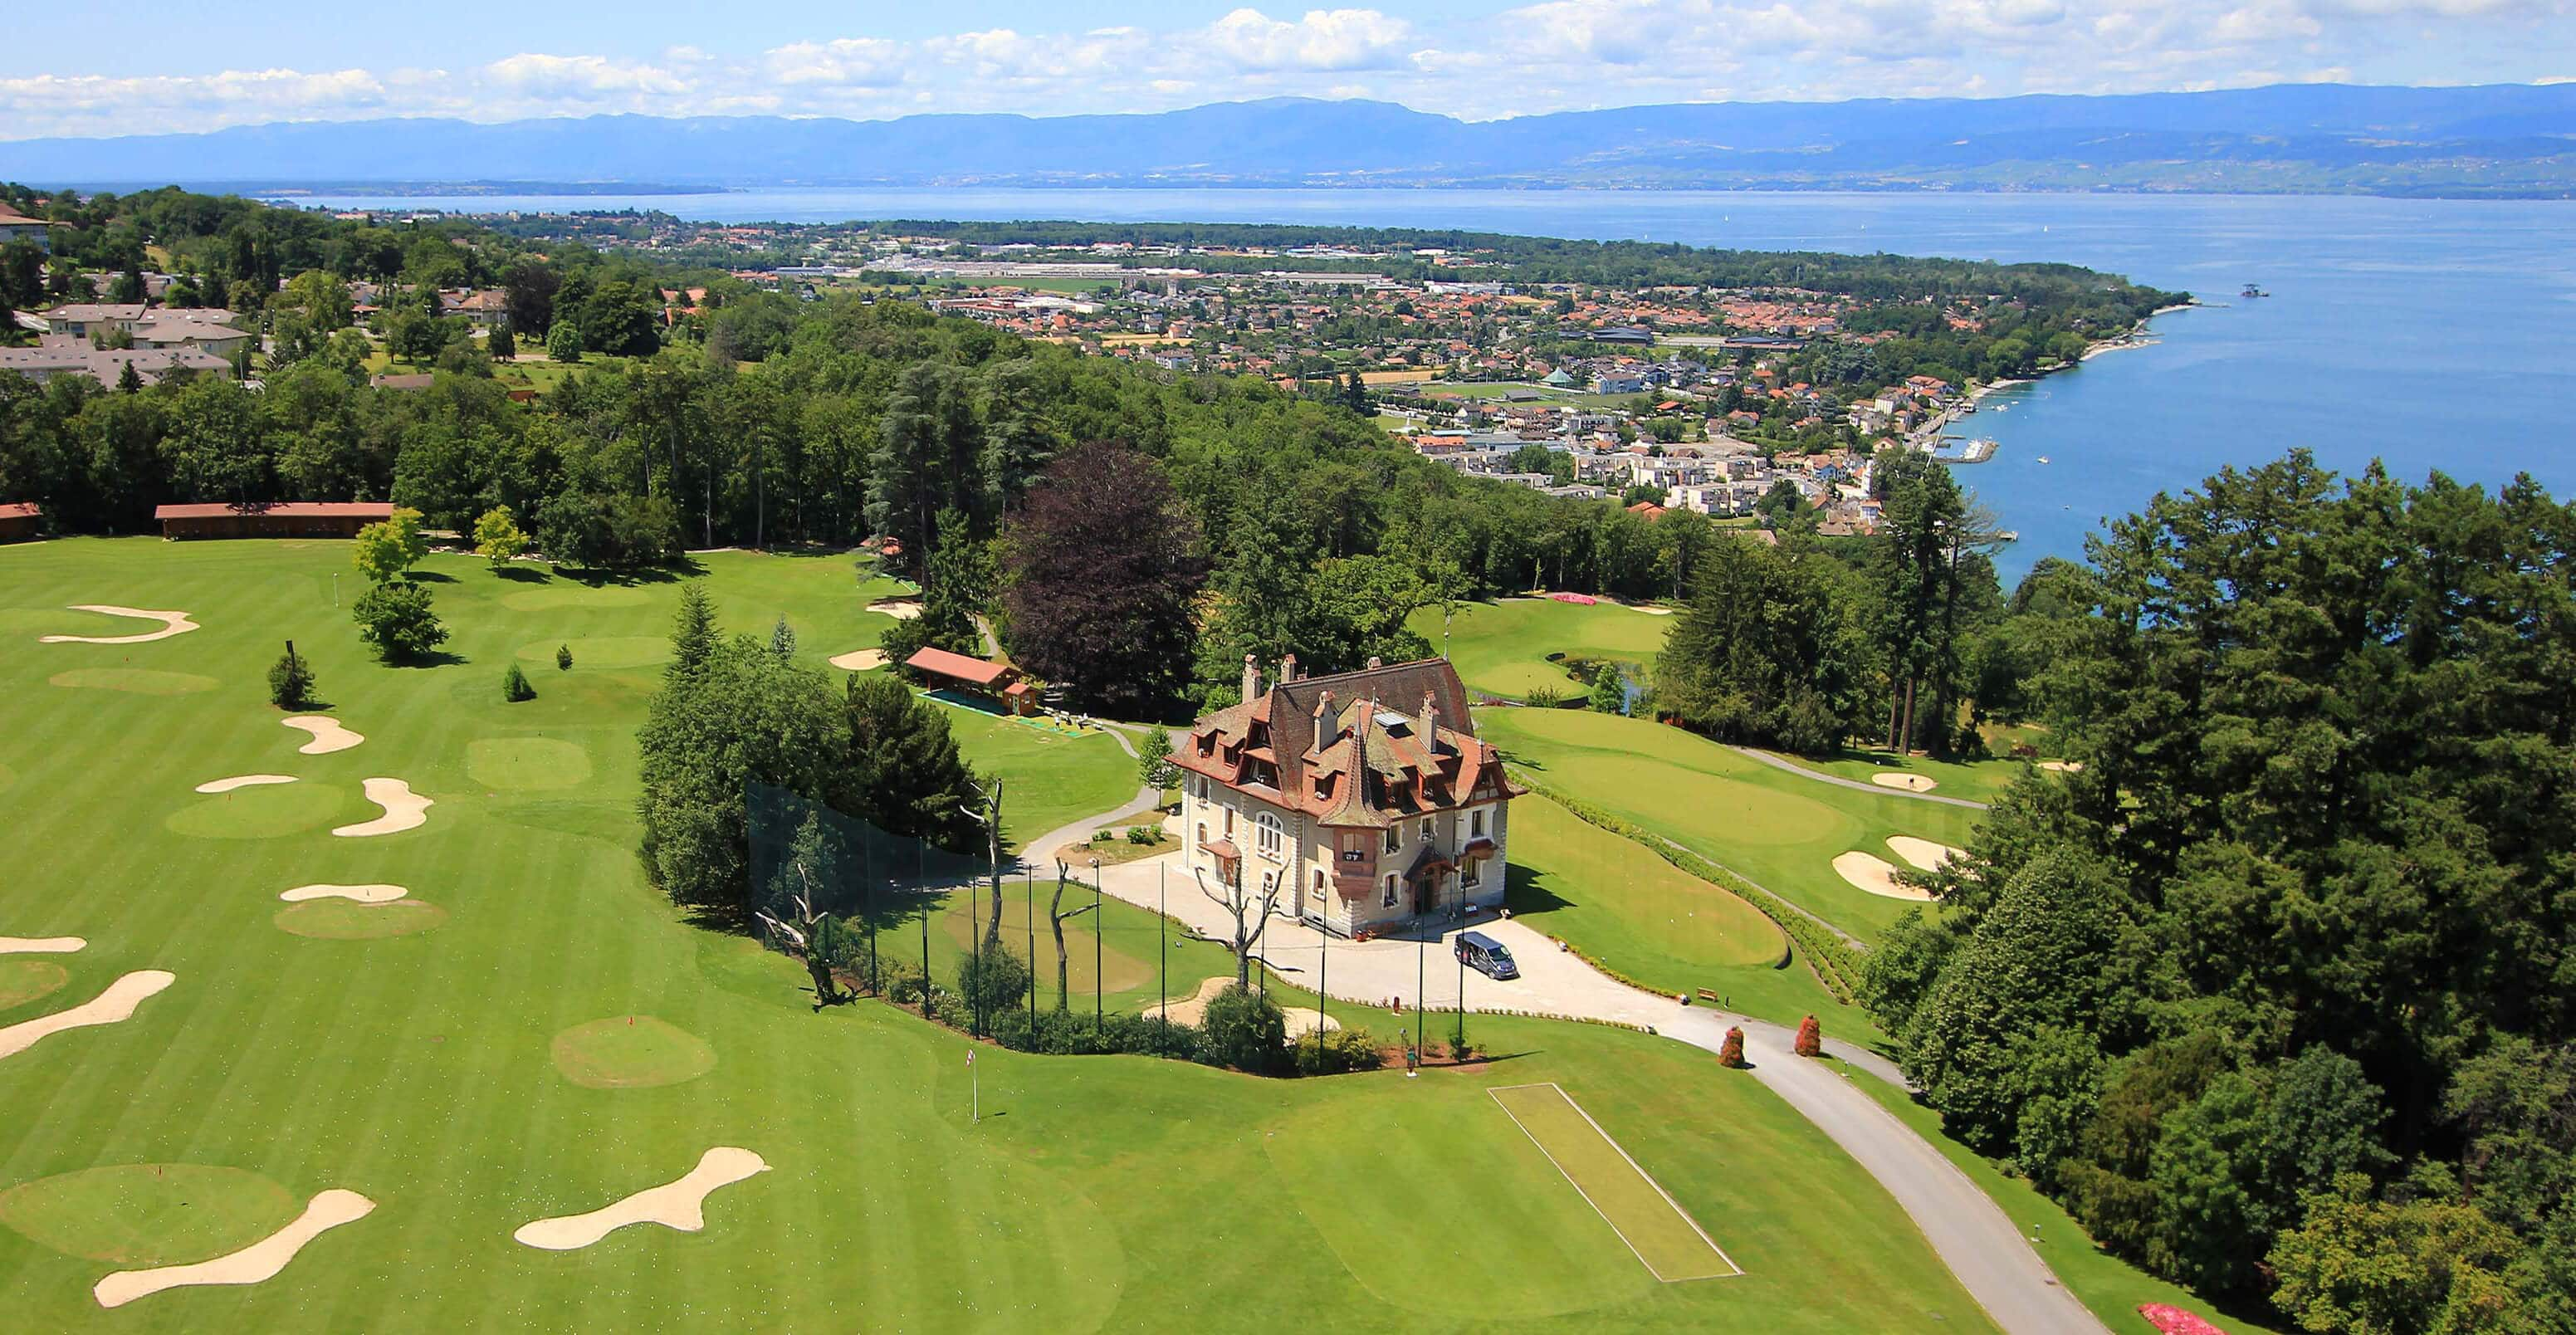 Evian Golf Cruise